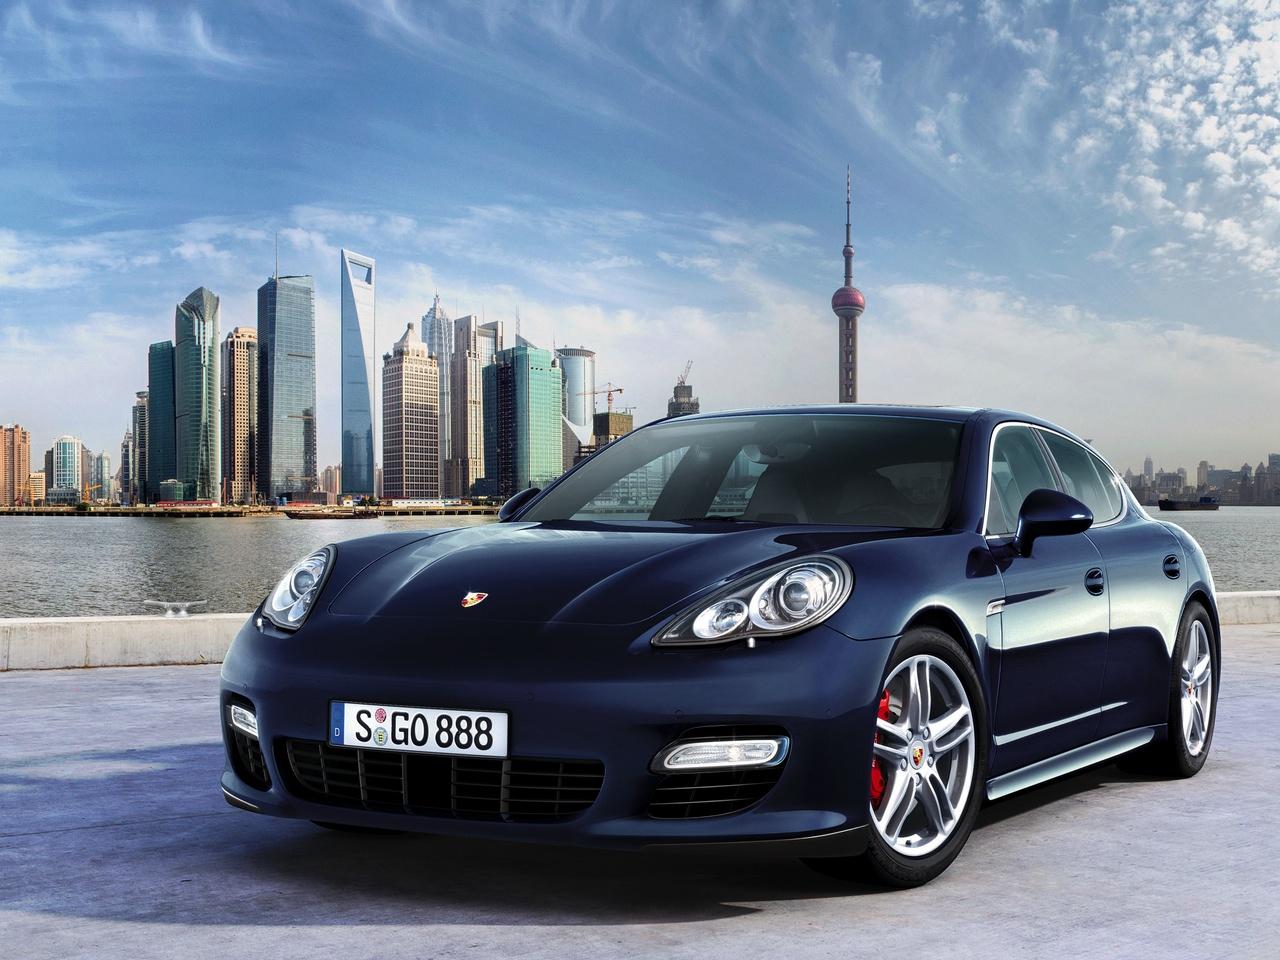 Luxury Vehicle: Porsche Panamera